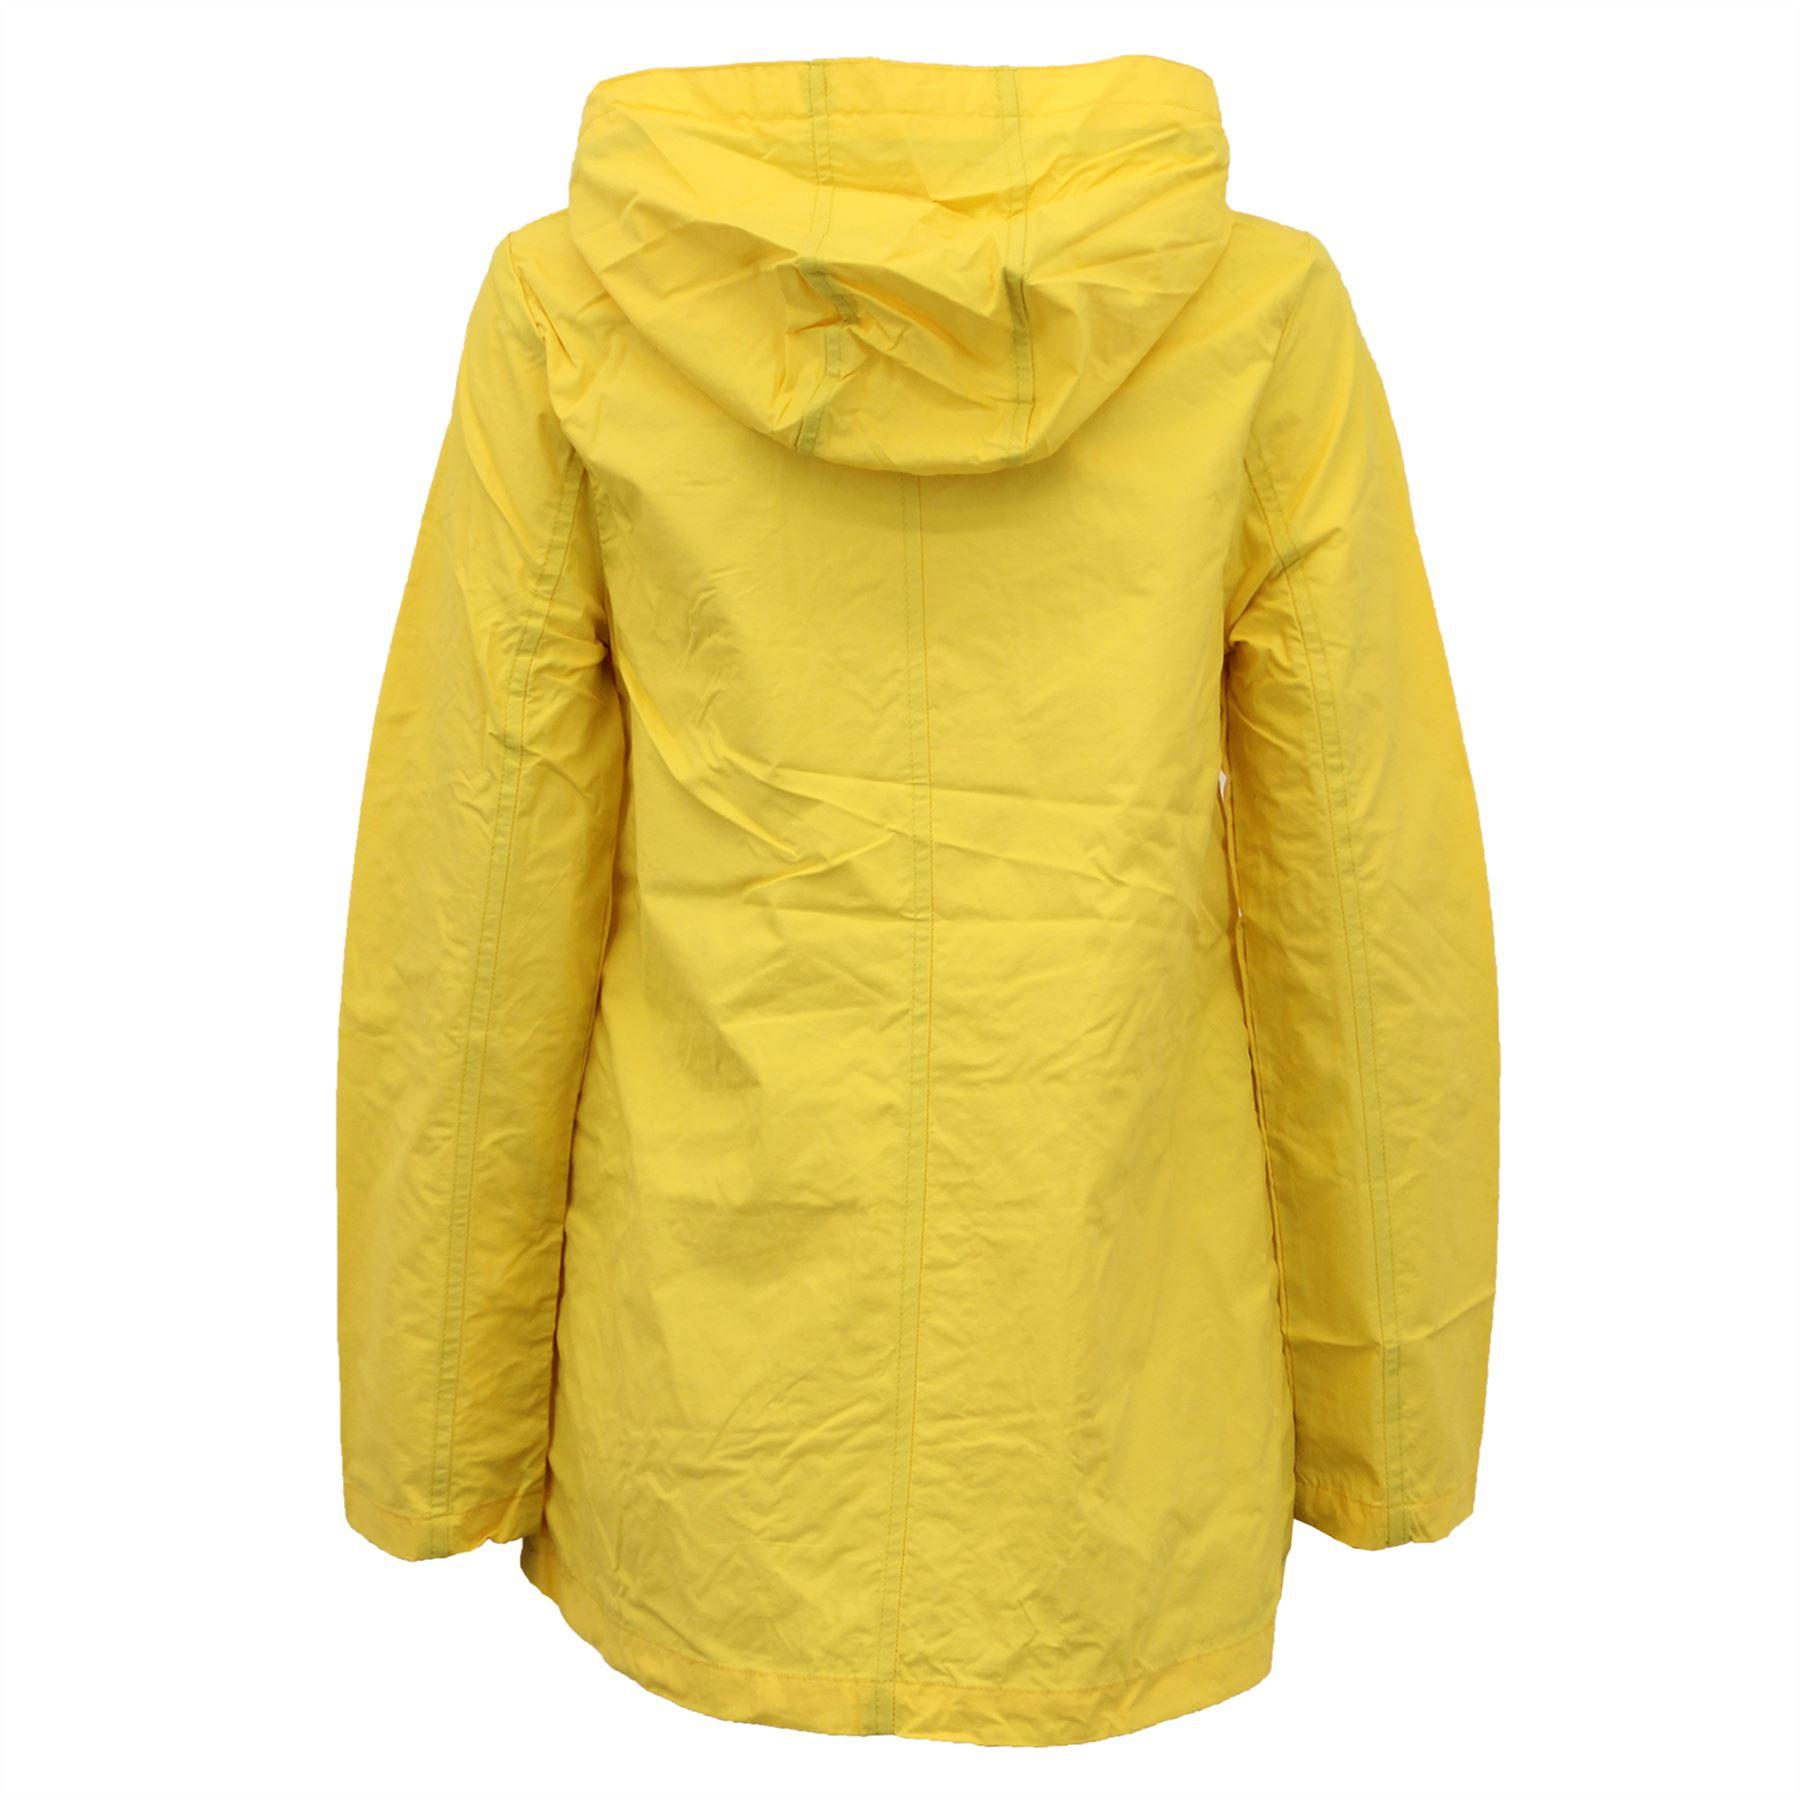 New-Womens-Lightweight-Rain-Trench-Coat-Jacket-Parka-Daily-Rain-Mac thumbnail 17